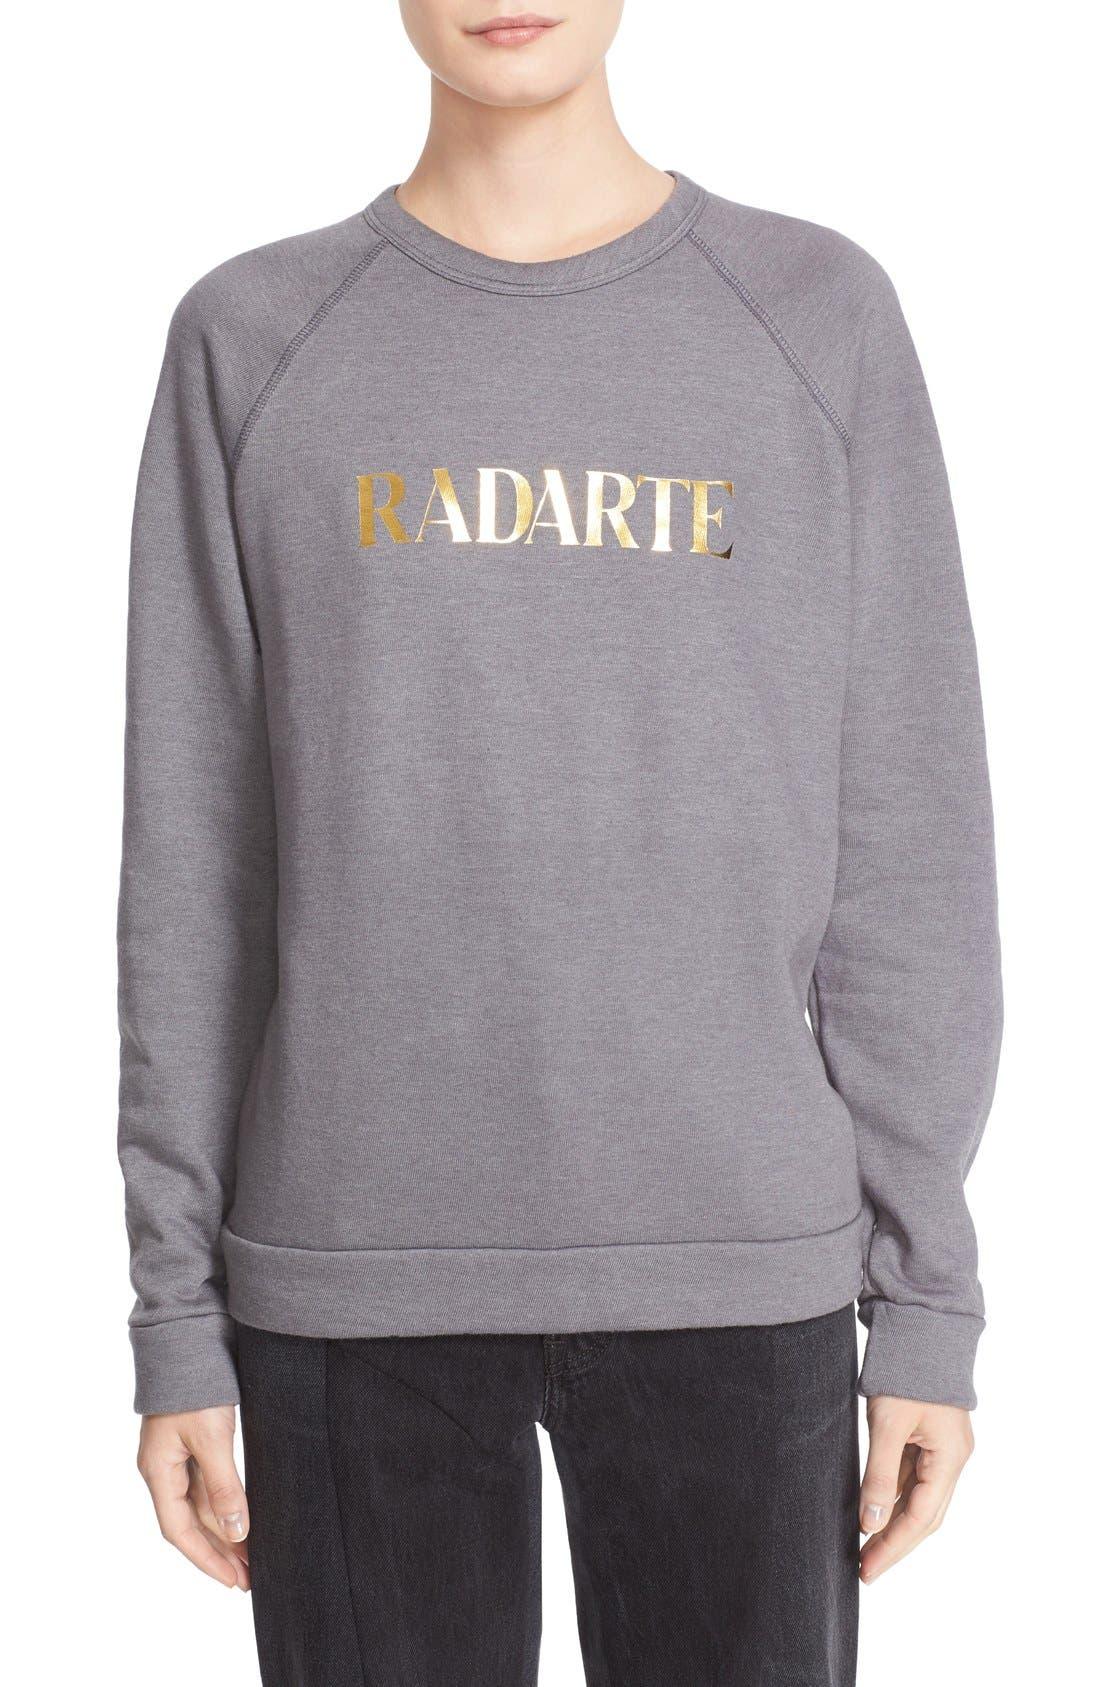 'Radarte' Foil Sweatshirt, Main, color, 022